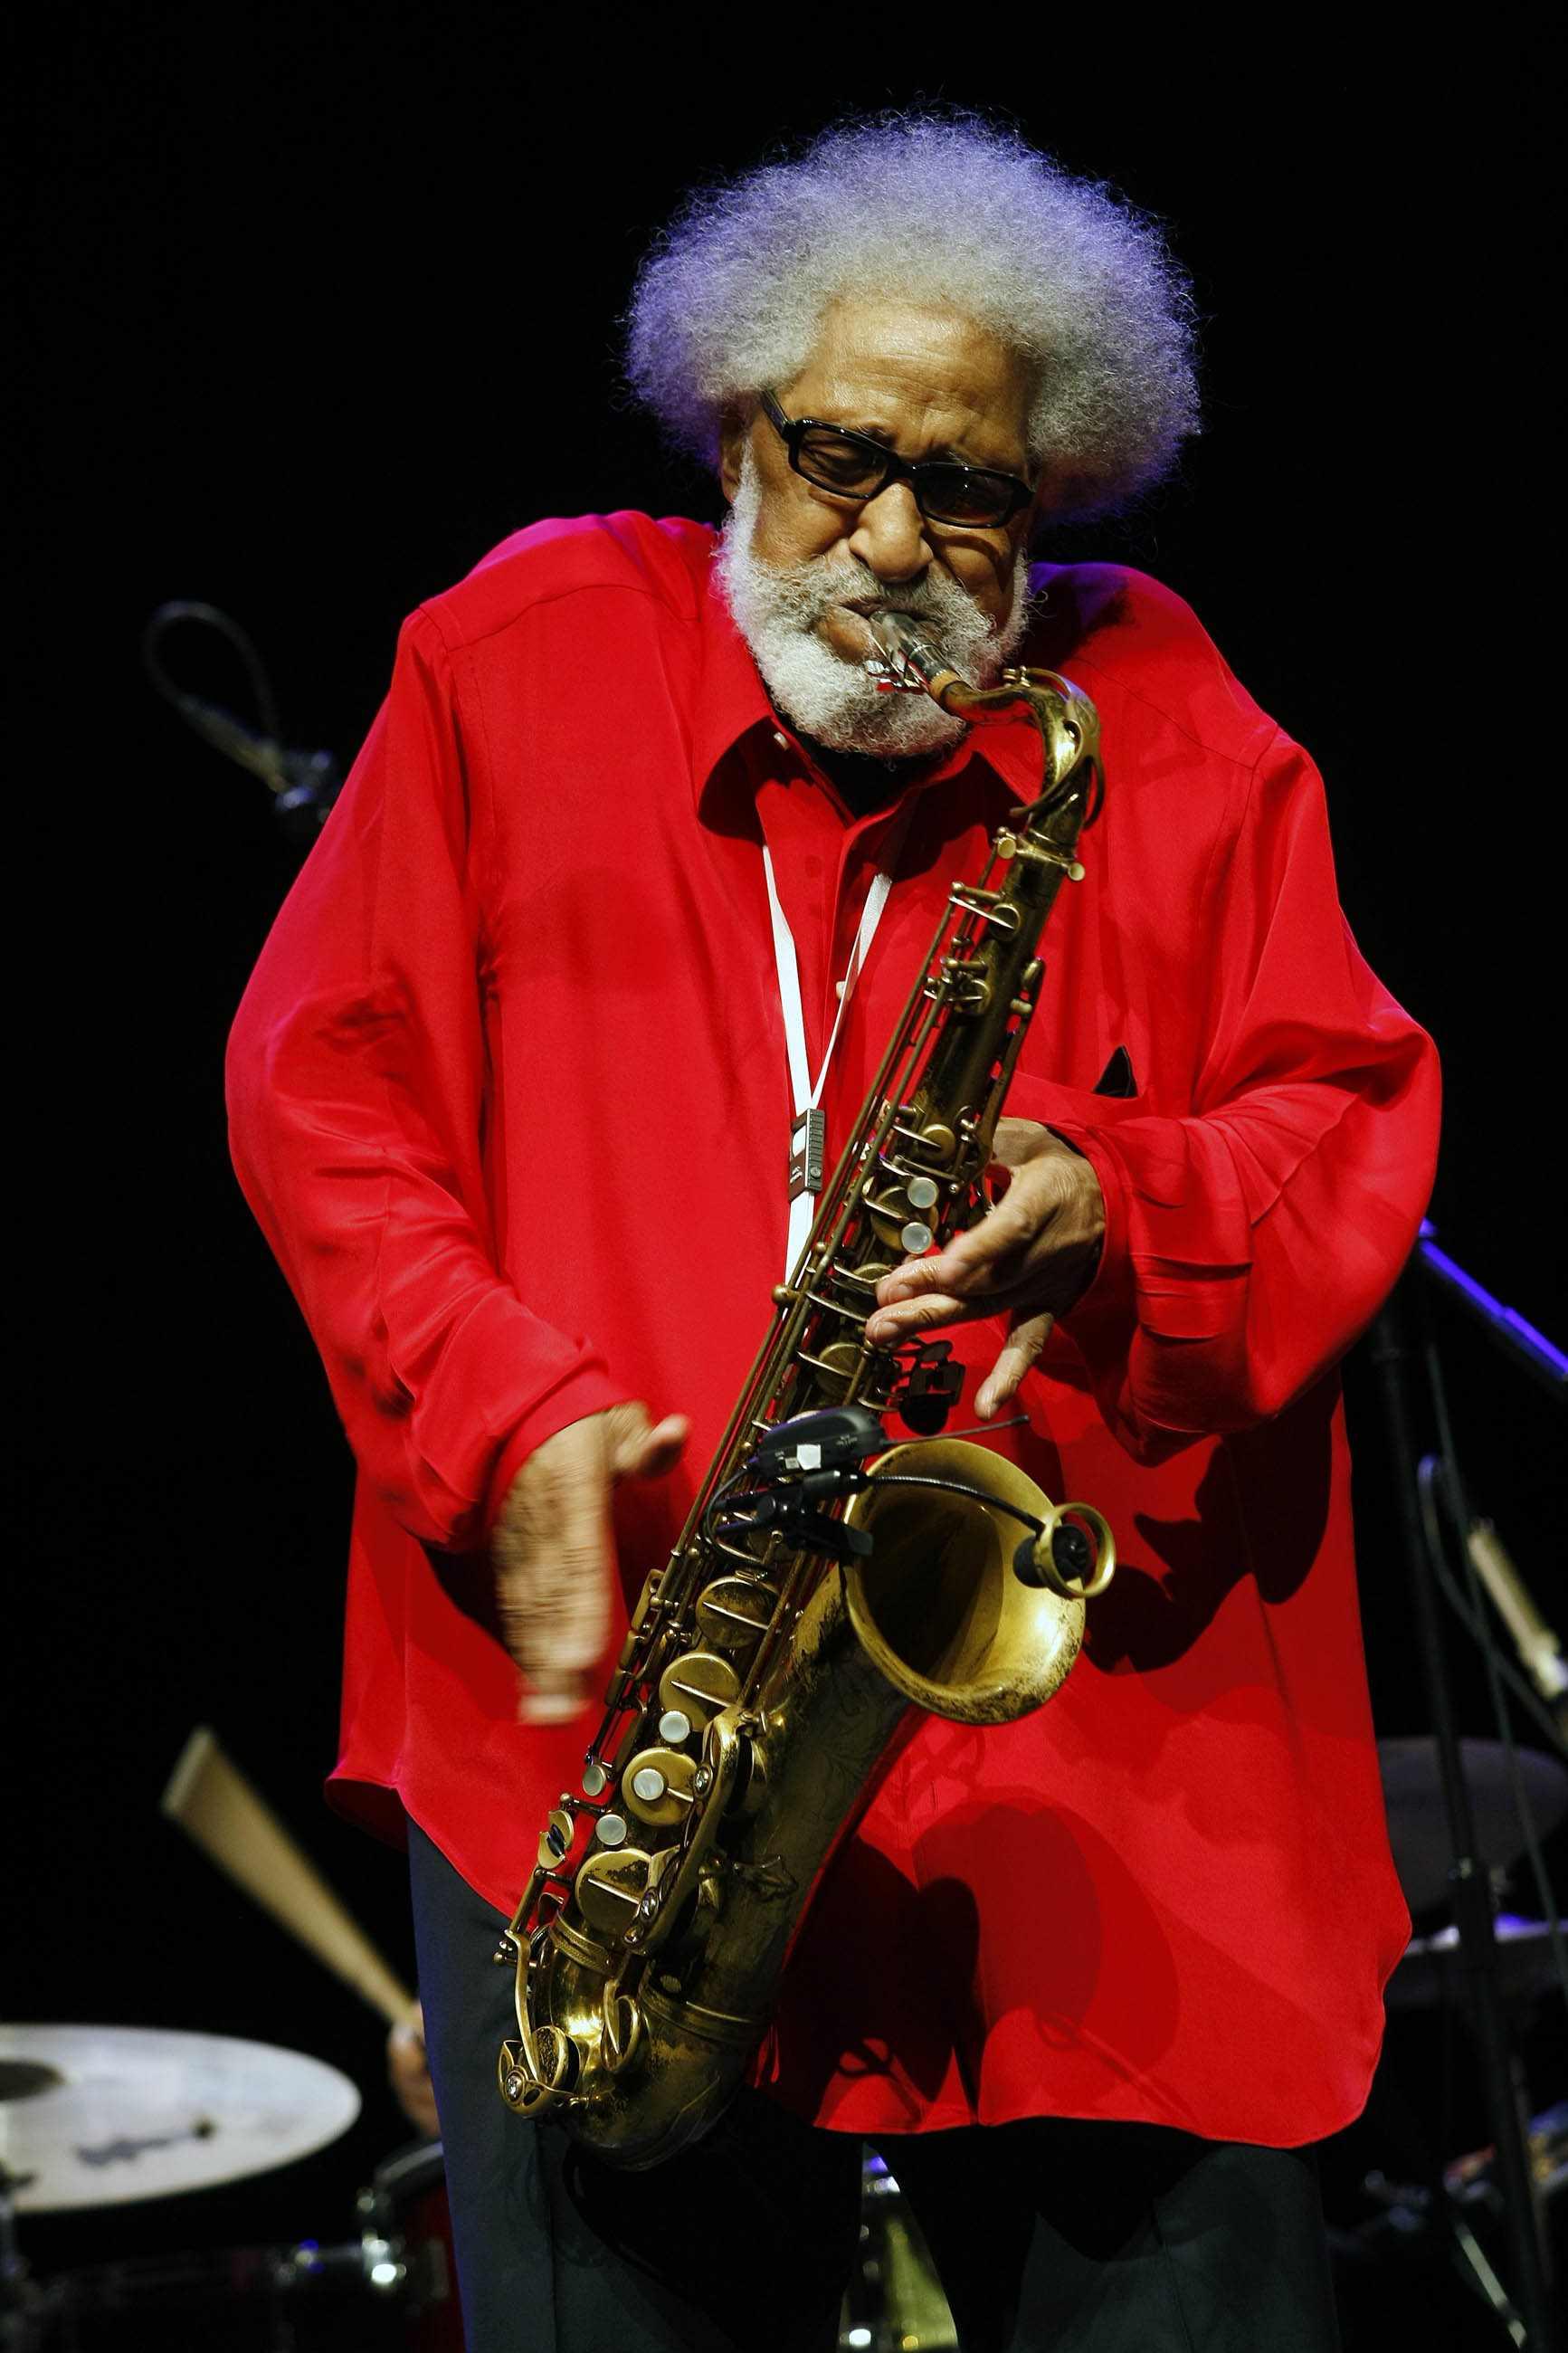 Sonny Rollins at the 2010 Barcelona Jazz Festival